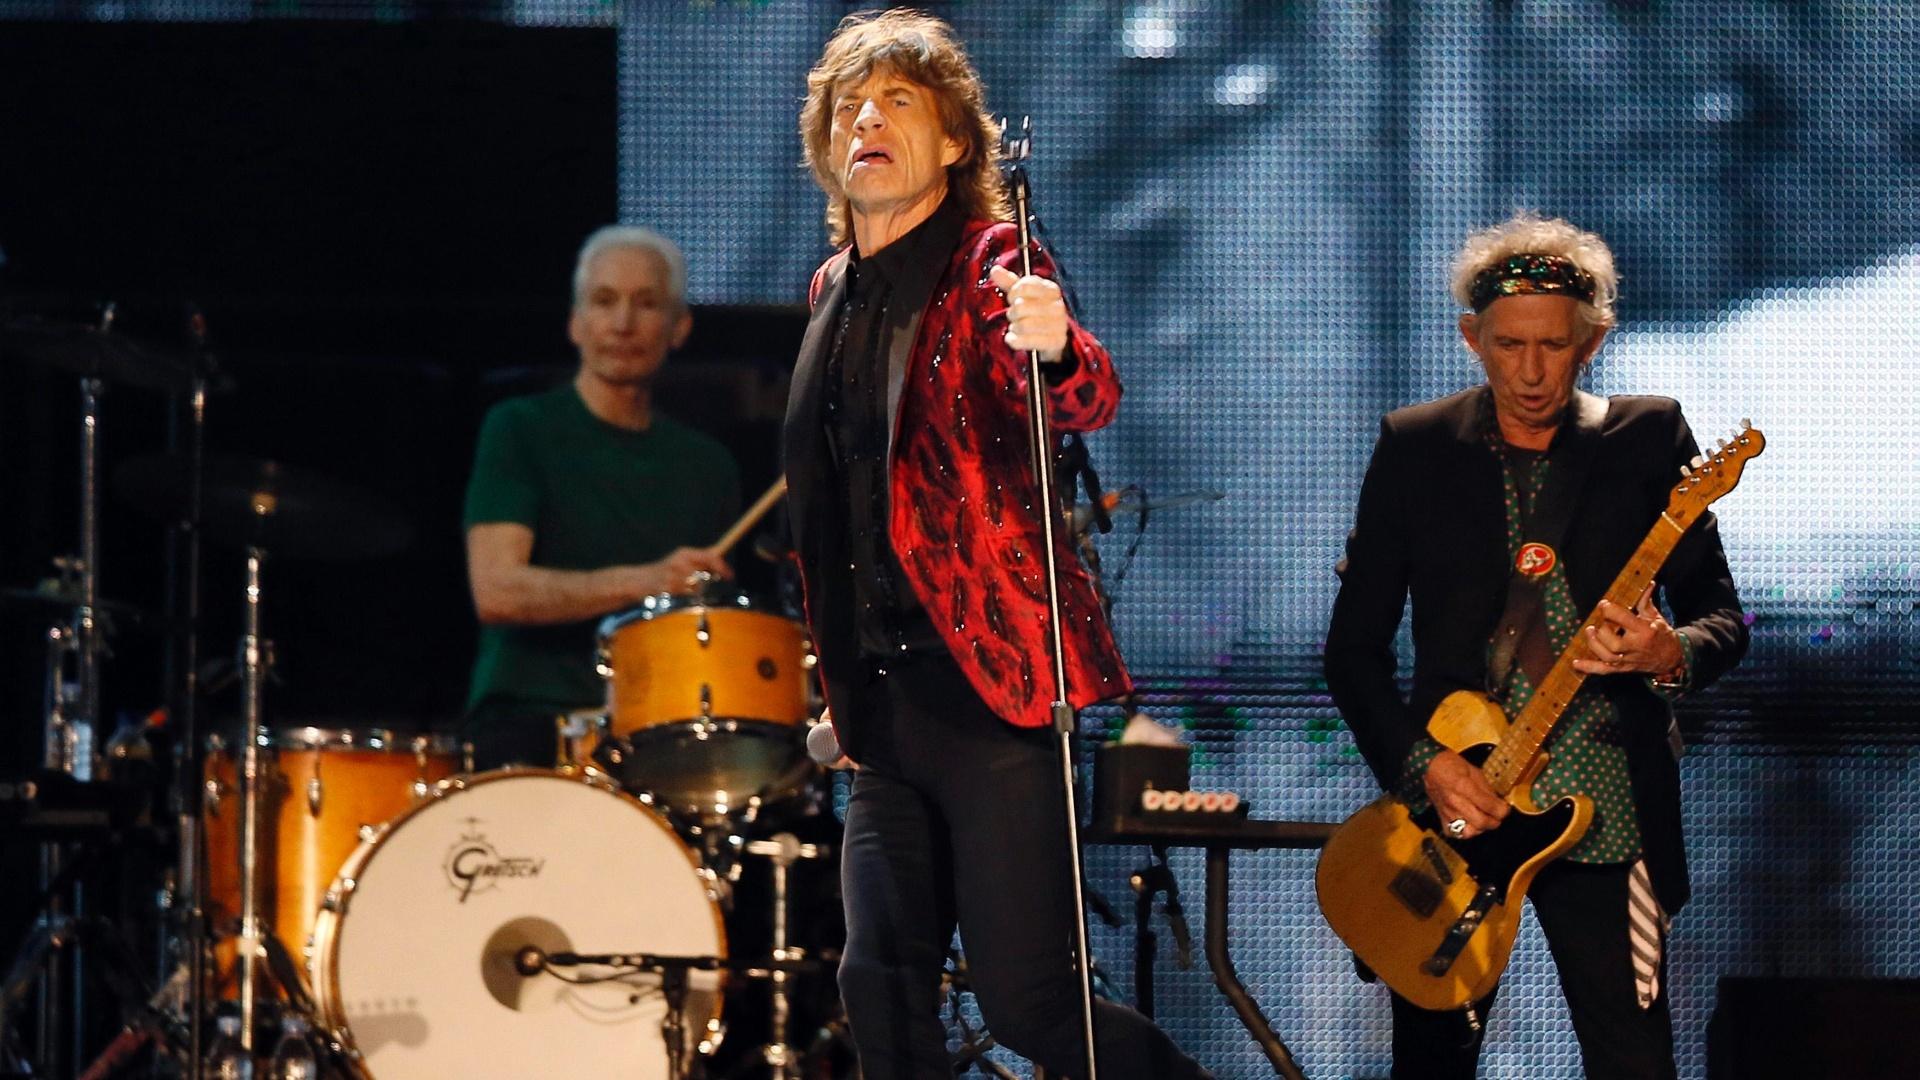 21.fev.2014 - Mick Jagger, Charlie Watts e Keith Richards, do Rolling Stones, fazem show em Abu Dhabi